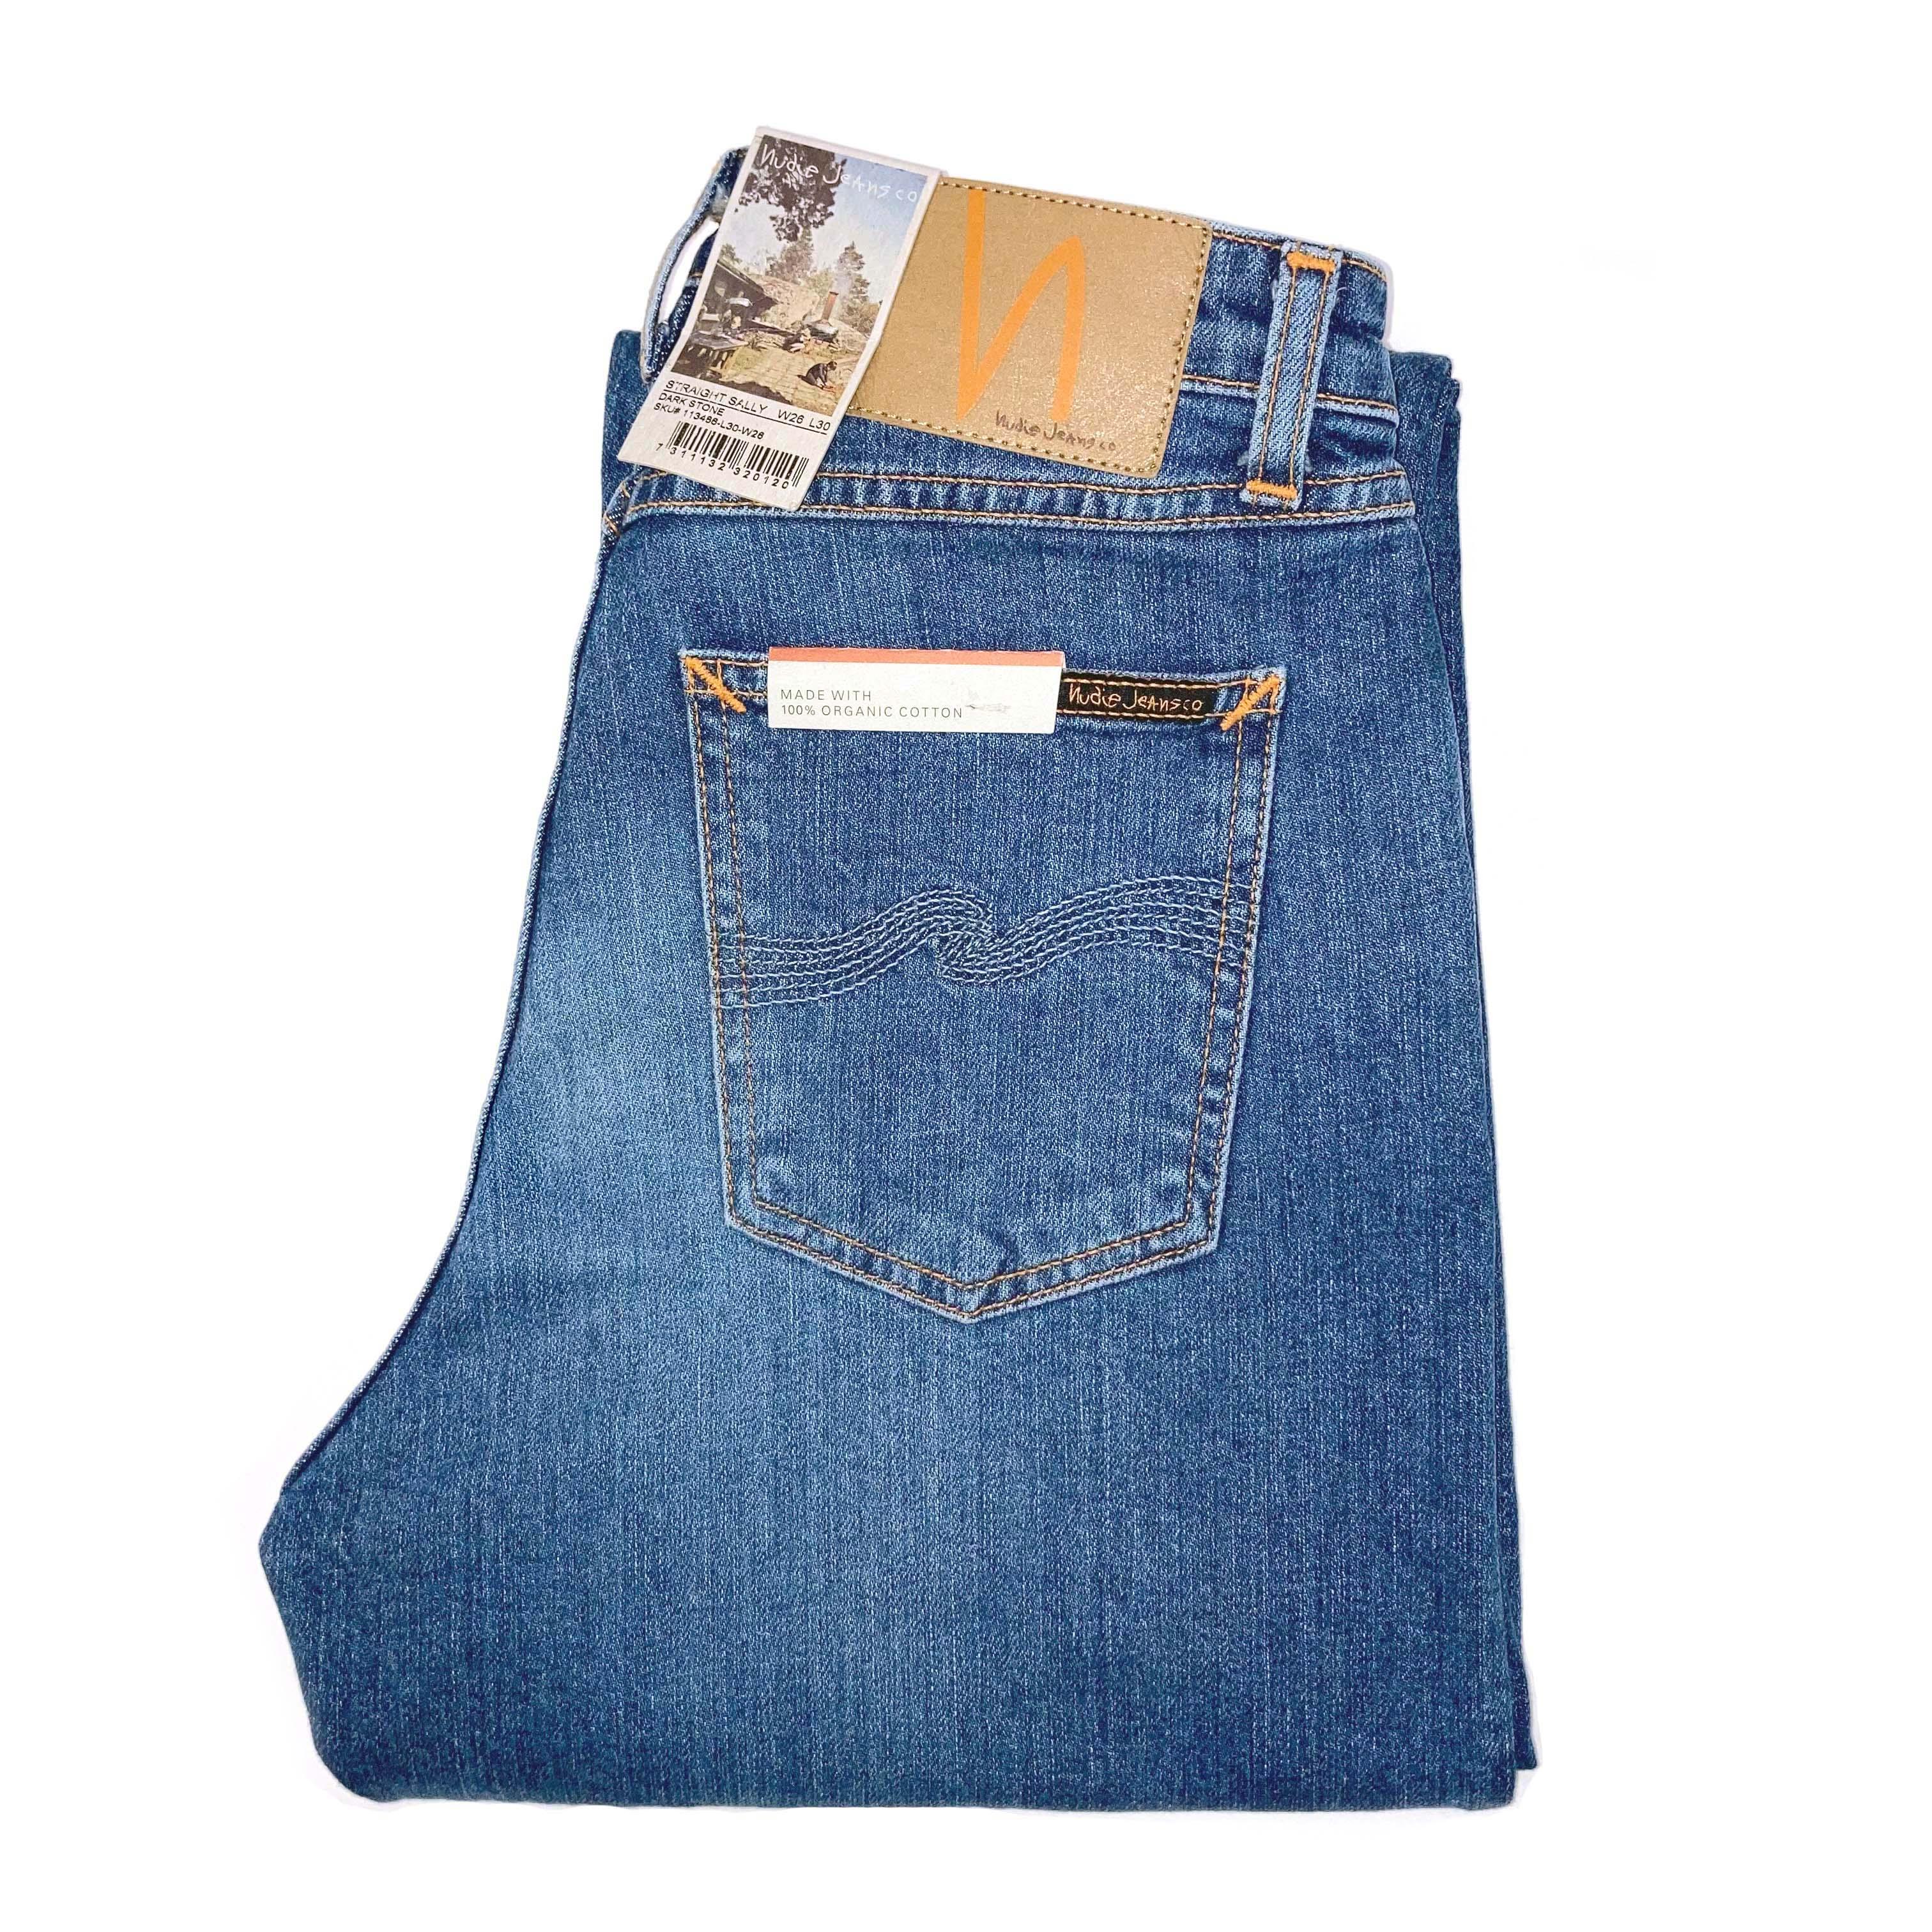 Nudie Jeans - STRAIGHT SALLY - Dark Stone